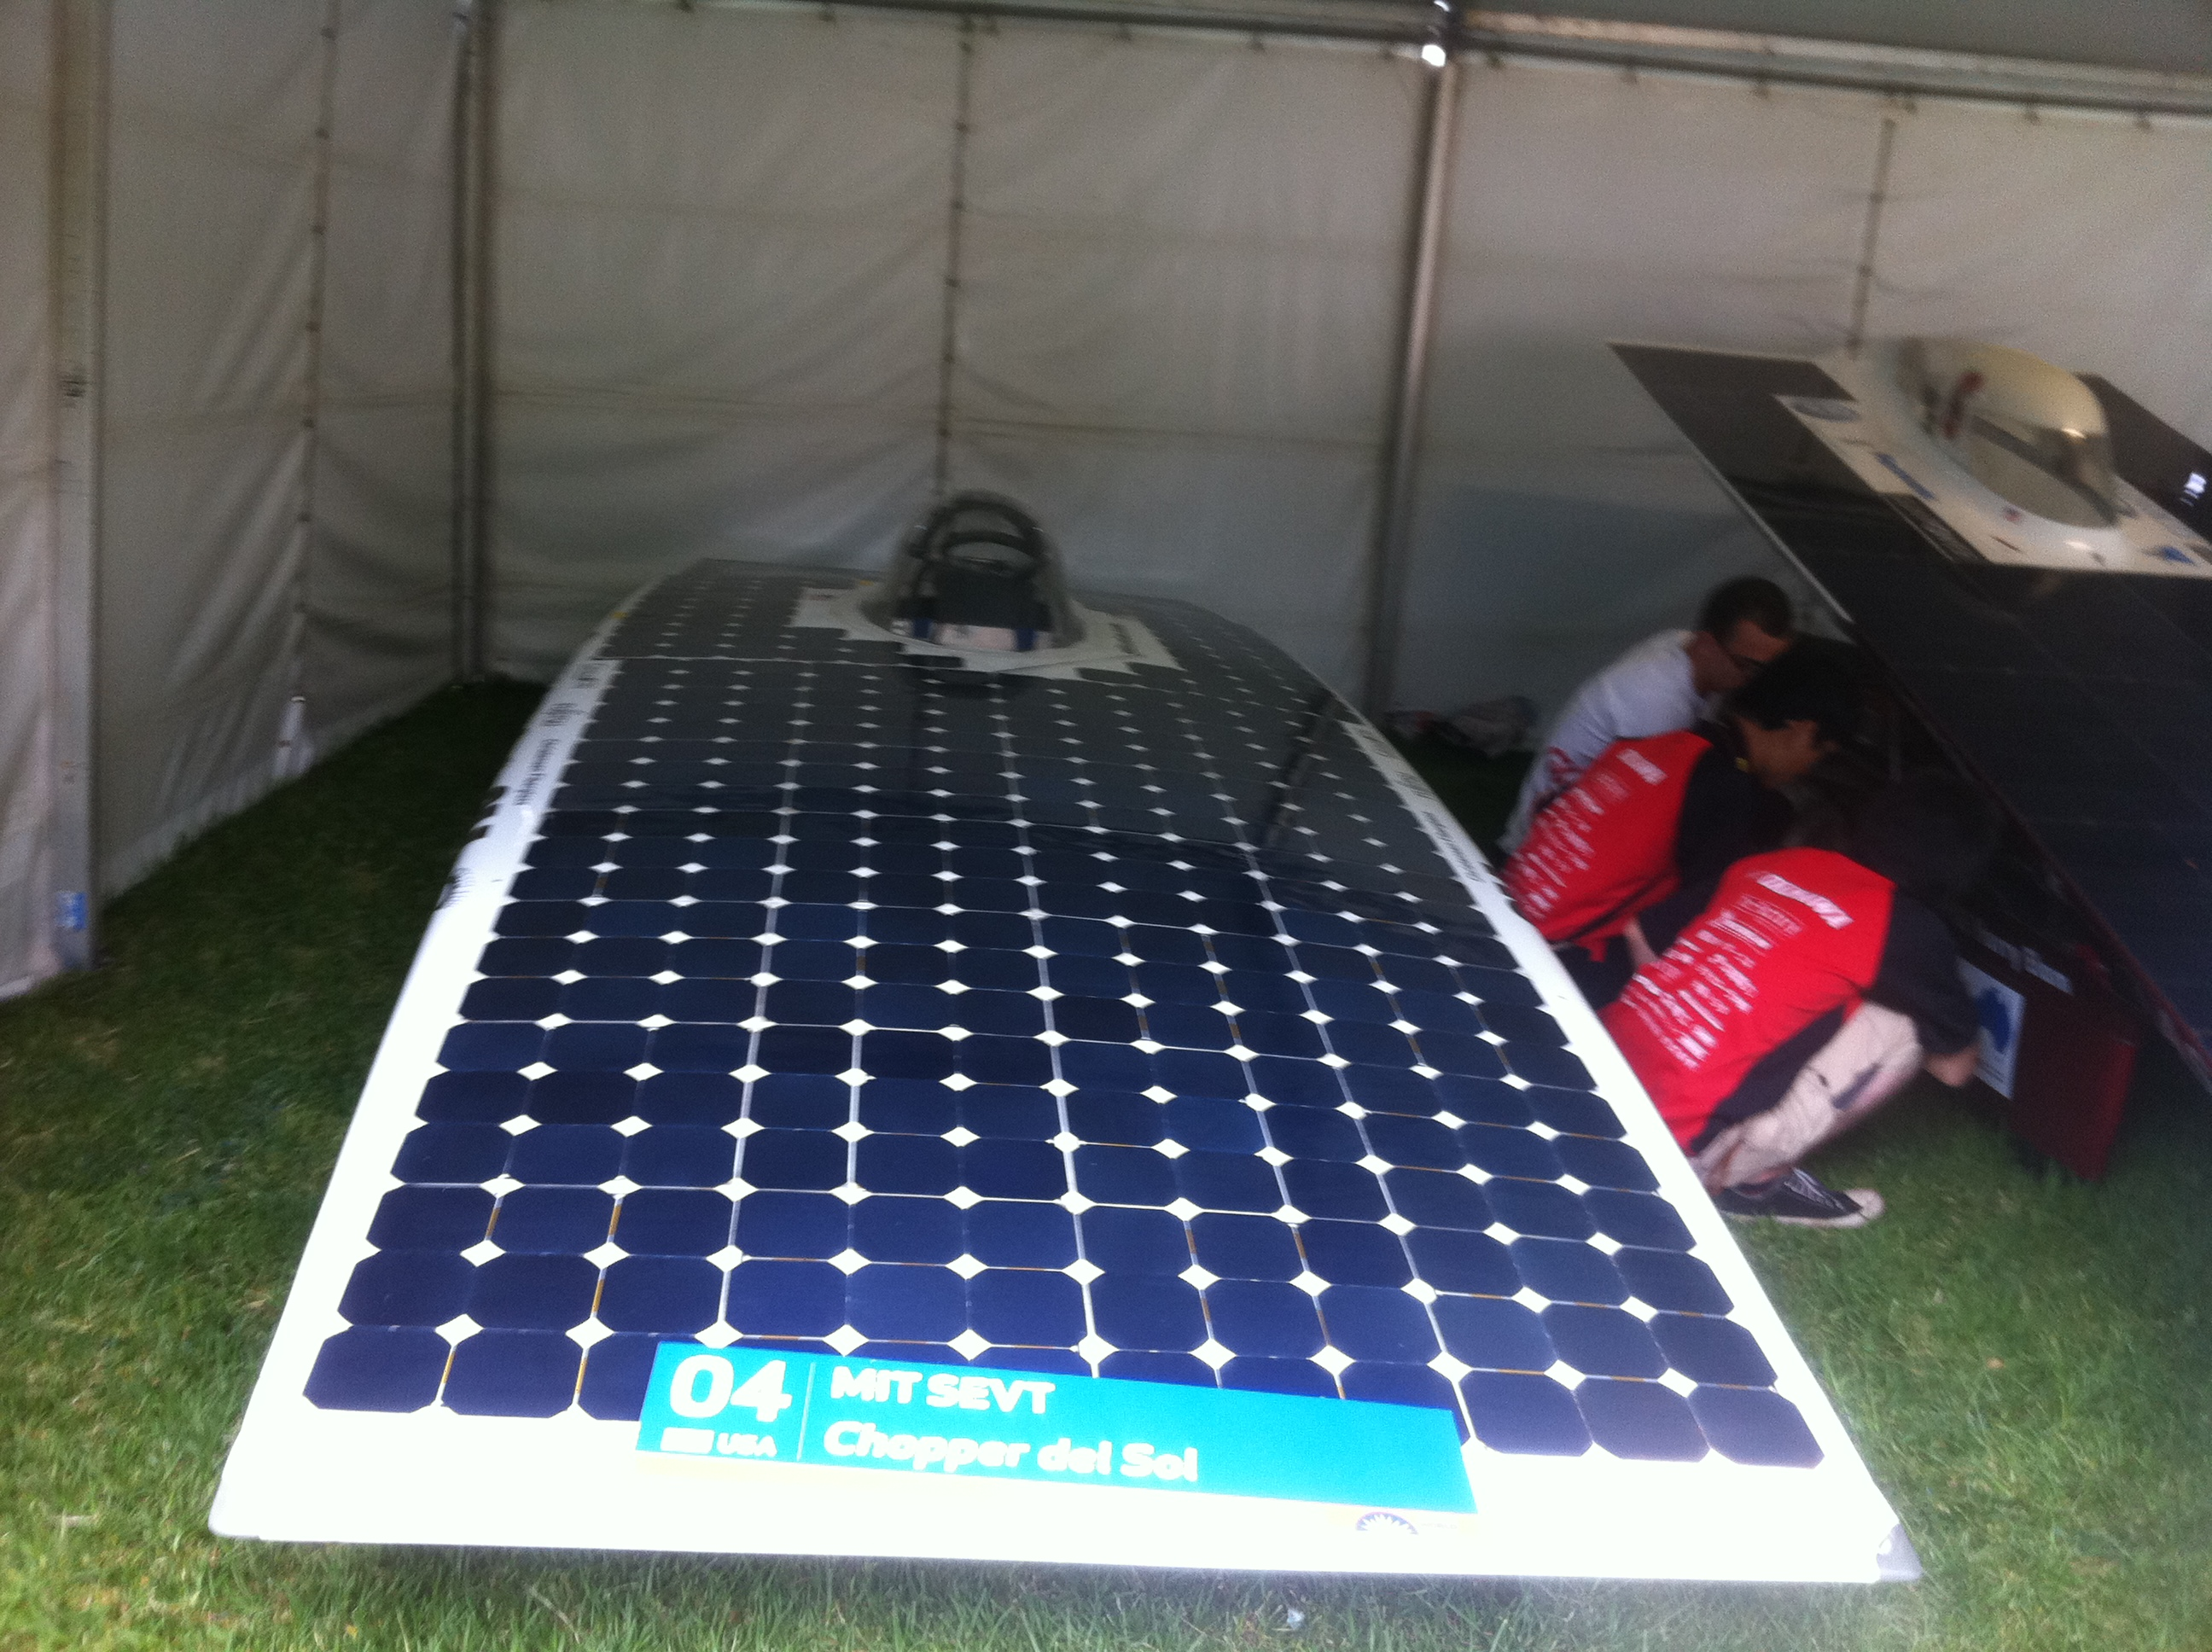 MIT Solar Electric Vehicle Team's Chopper Del Sol (USA)